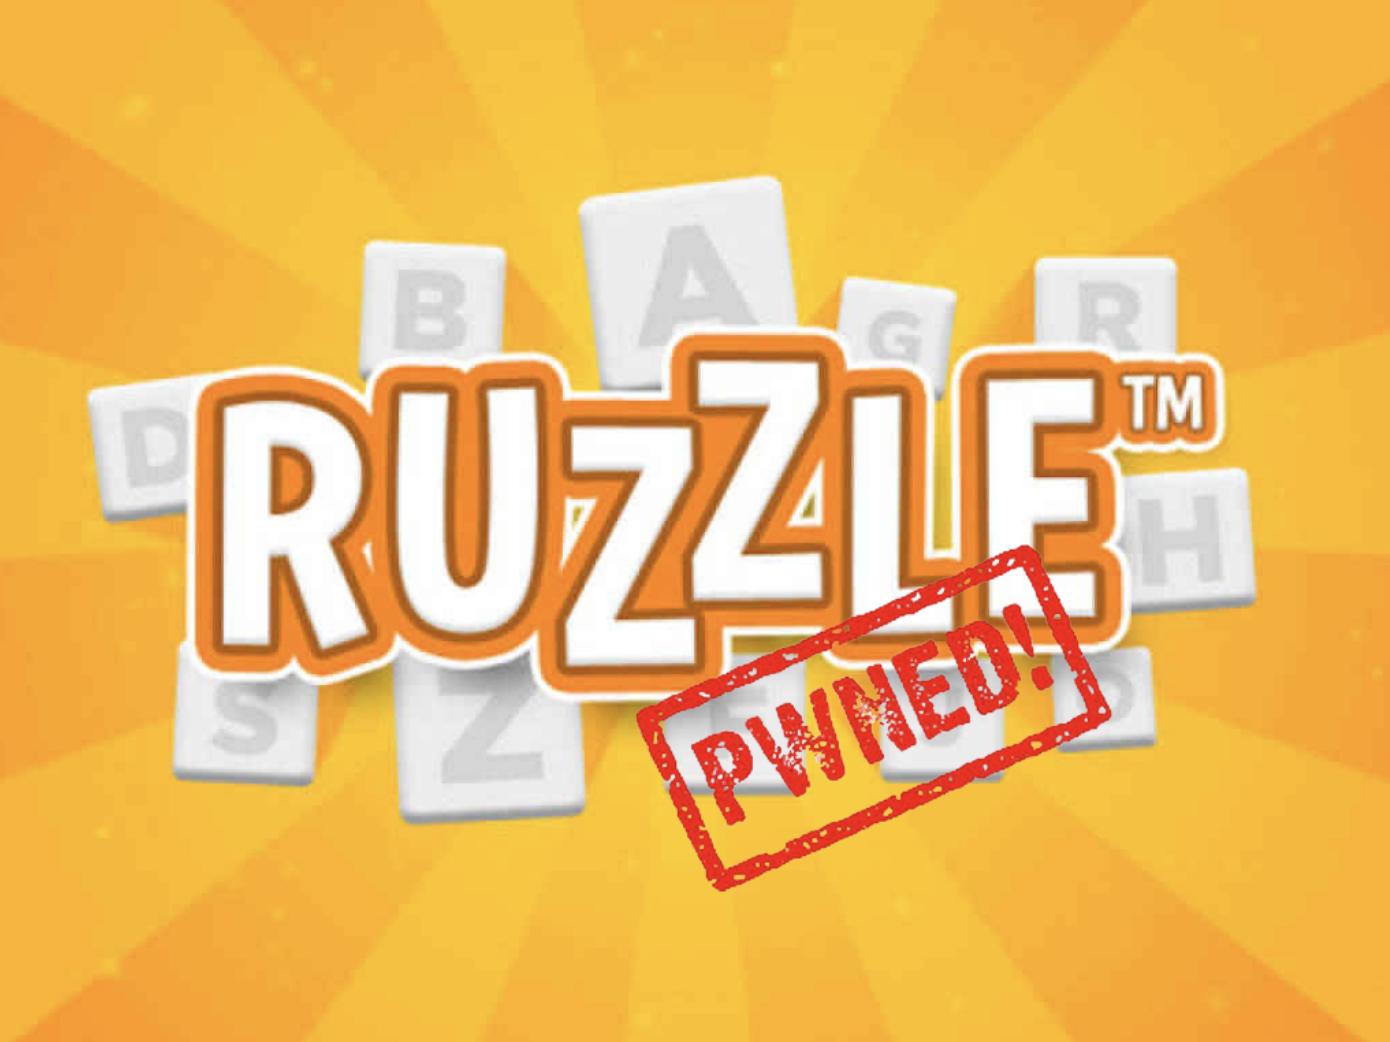 Abusing Ruzzle protocol, privacy violation and more…